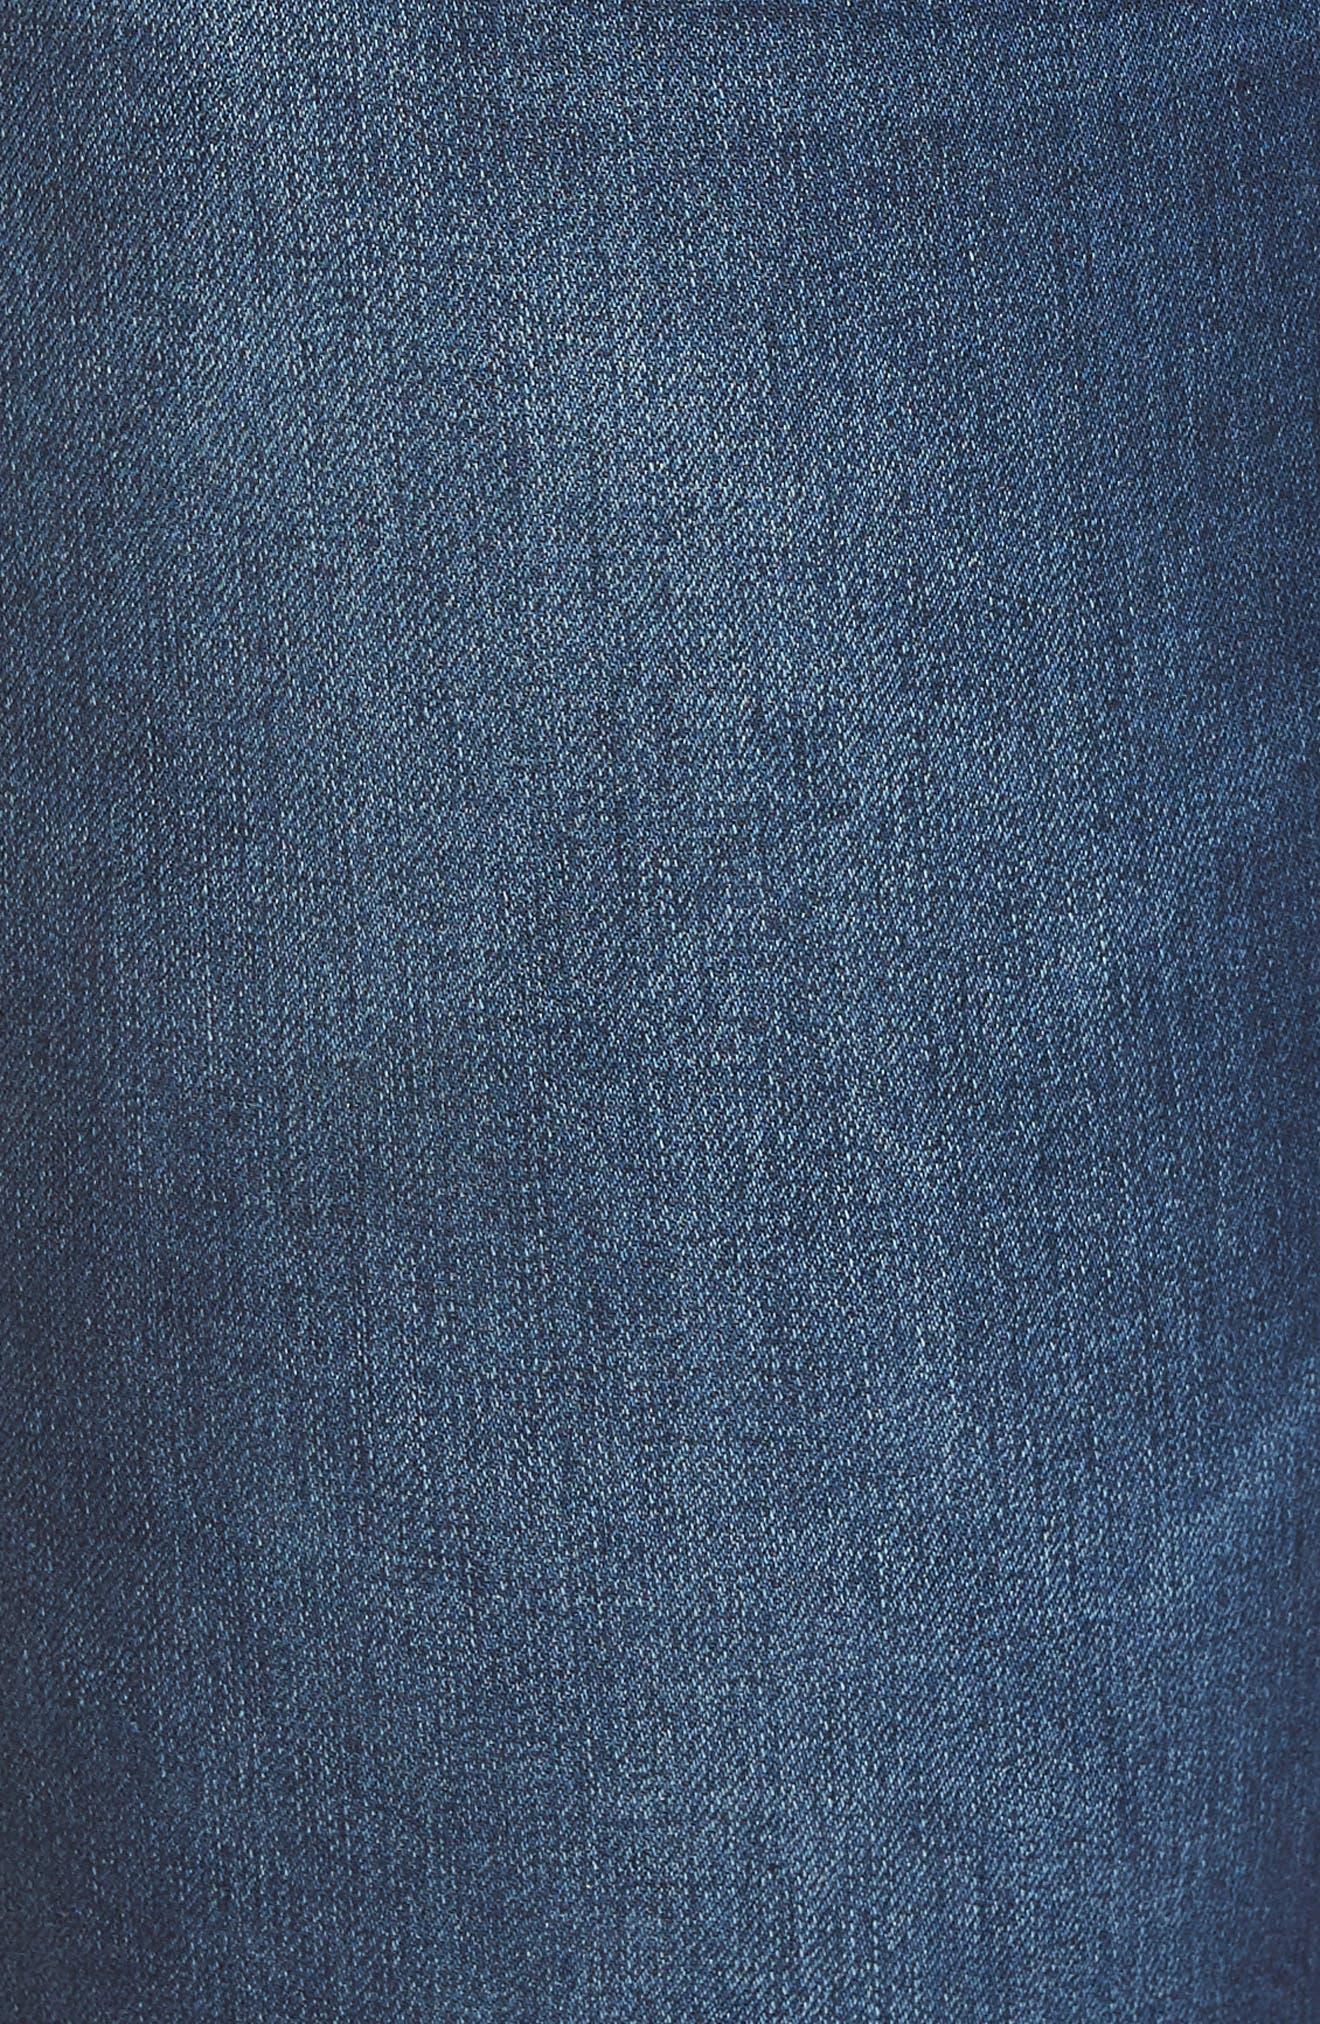 Nora Stretch Skinny Jeans,                             Alternate thumbnail 6, color,                             MED INDIGO